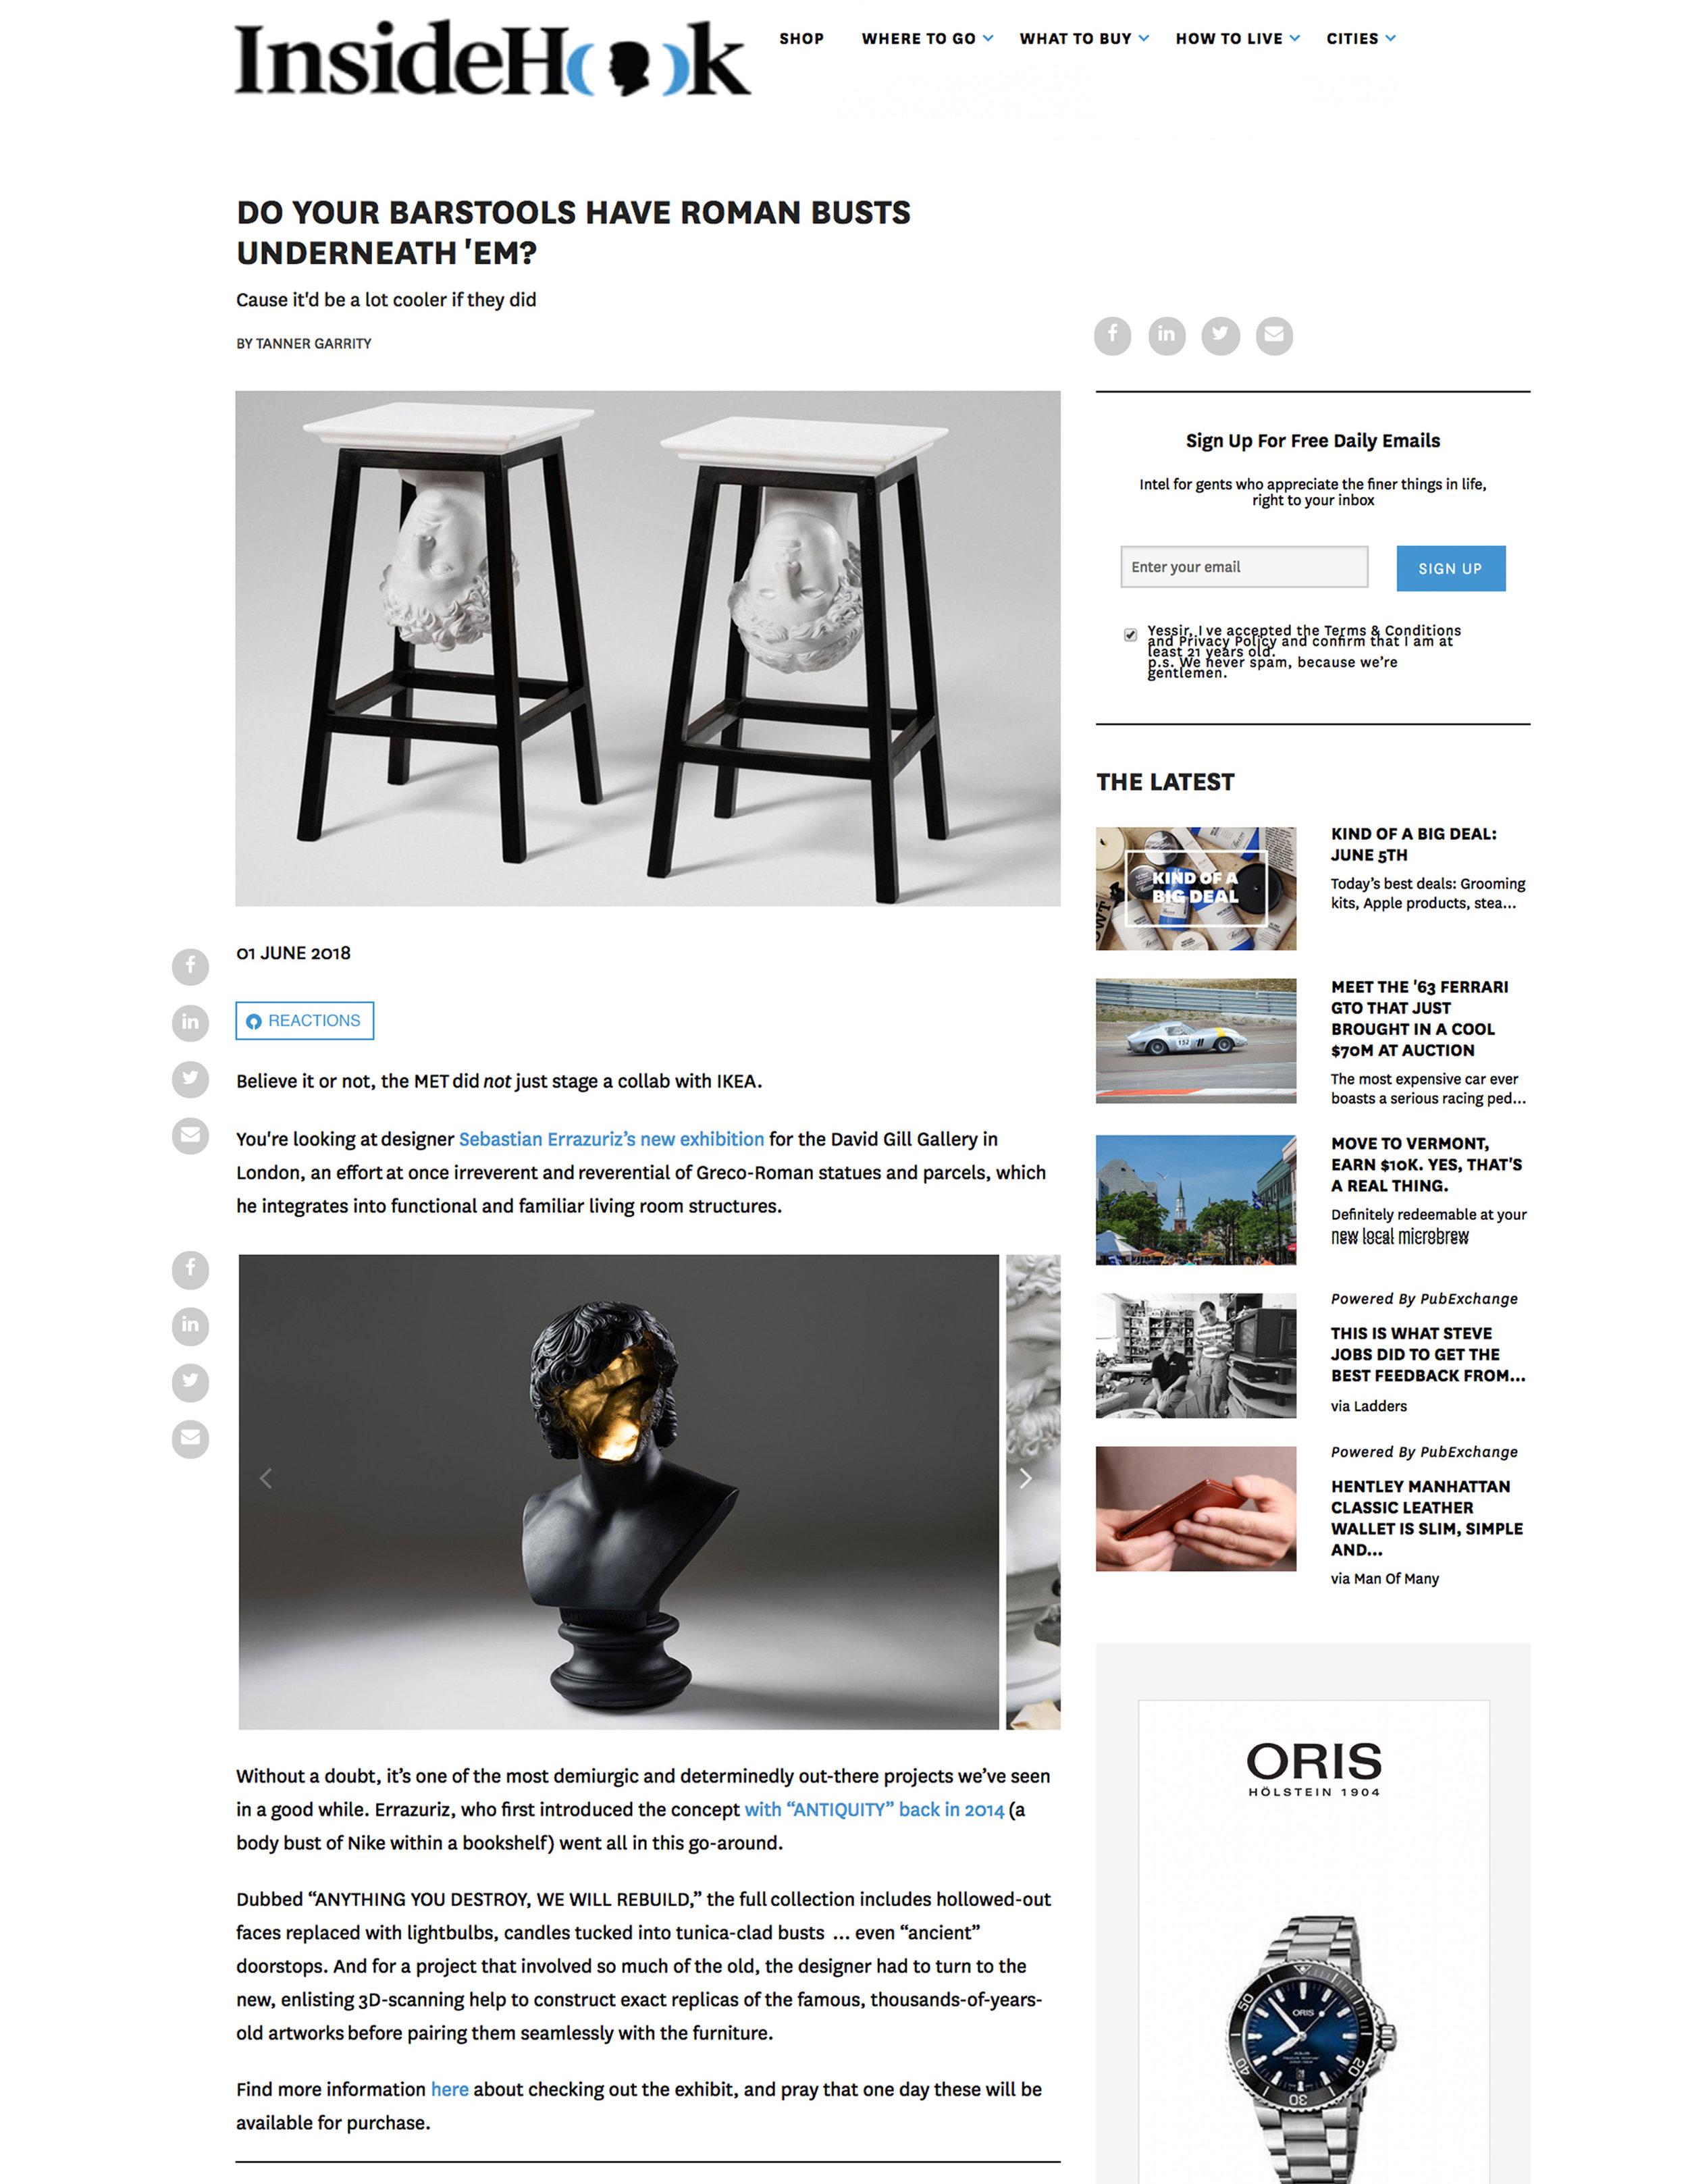 GillPress_Press_mr_InsidehookLetter_1.jpg